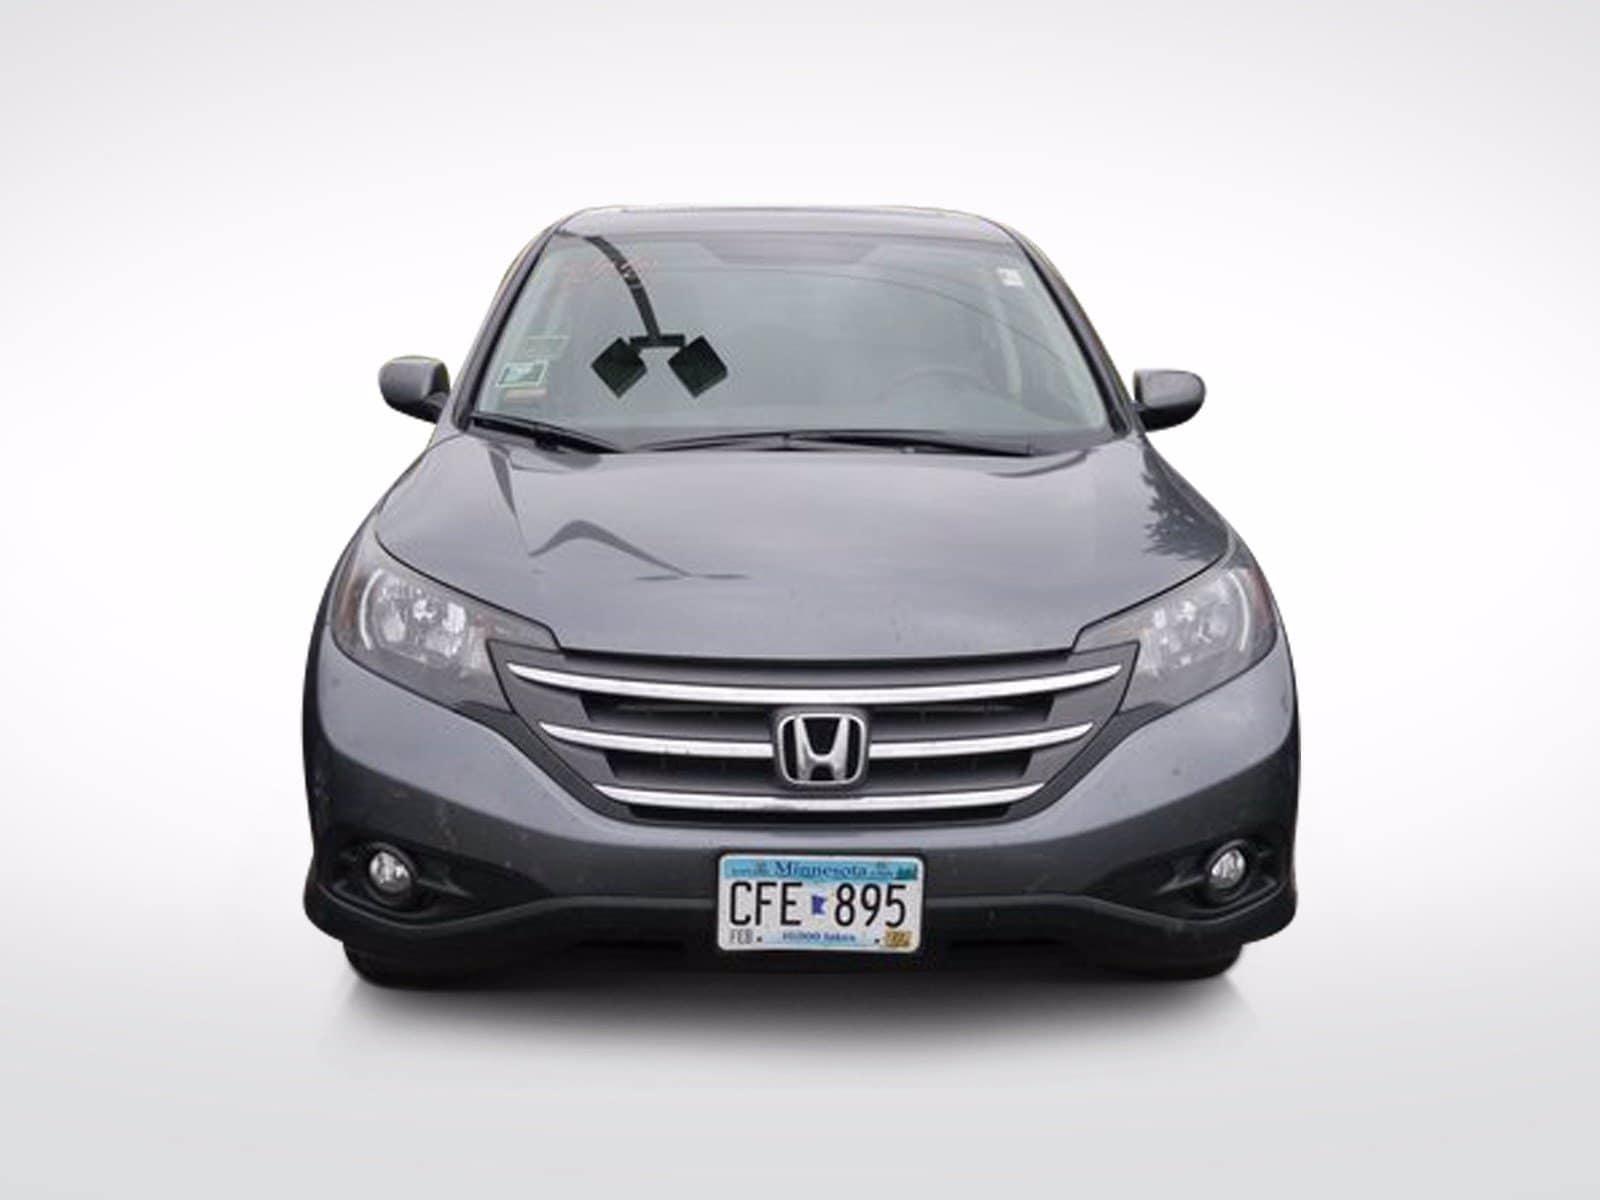 Used 2012 Honda CR-V EX with VIN 5J6RM4H56CL059120 for sale in Baxter, Minnesota